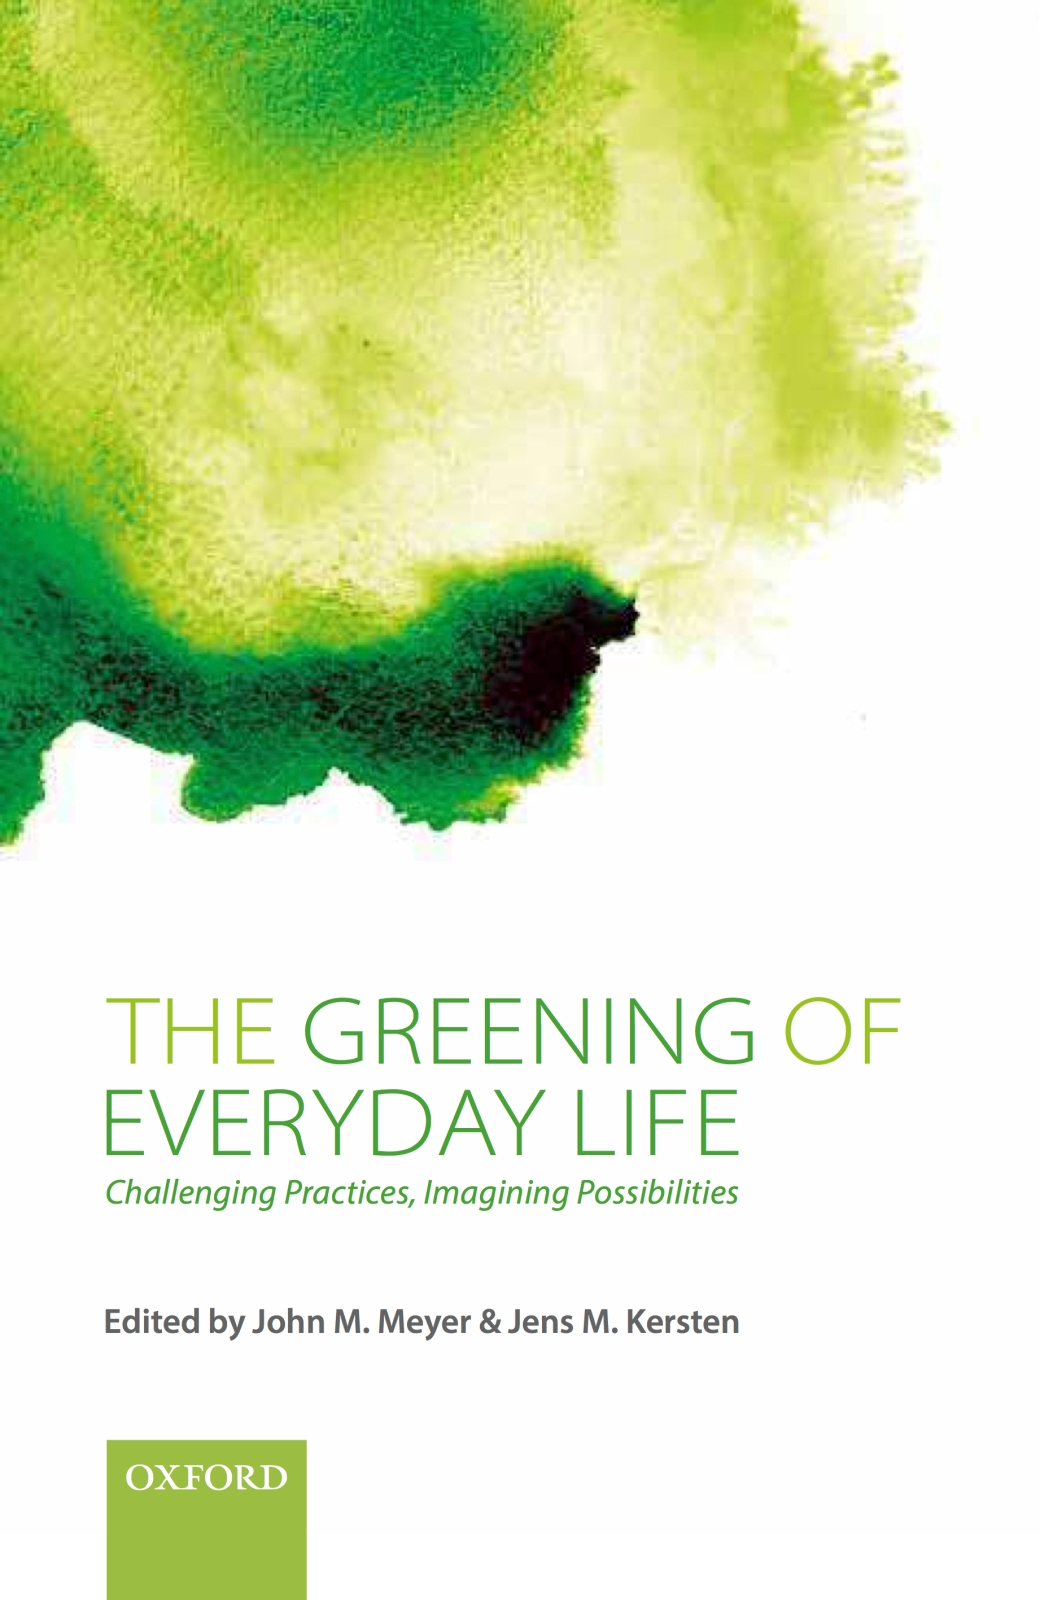 greening-of-everyday-life